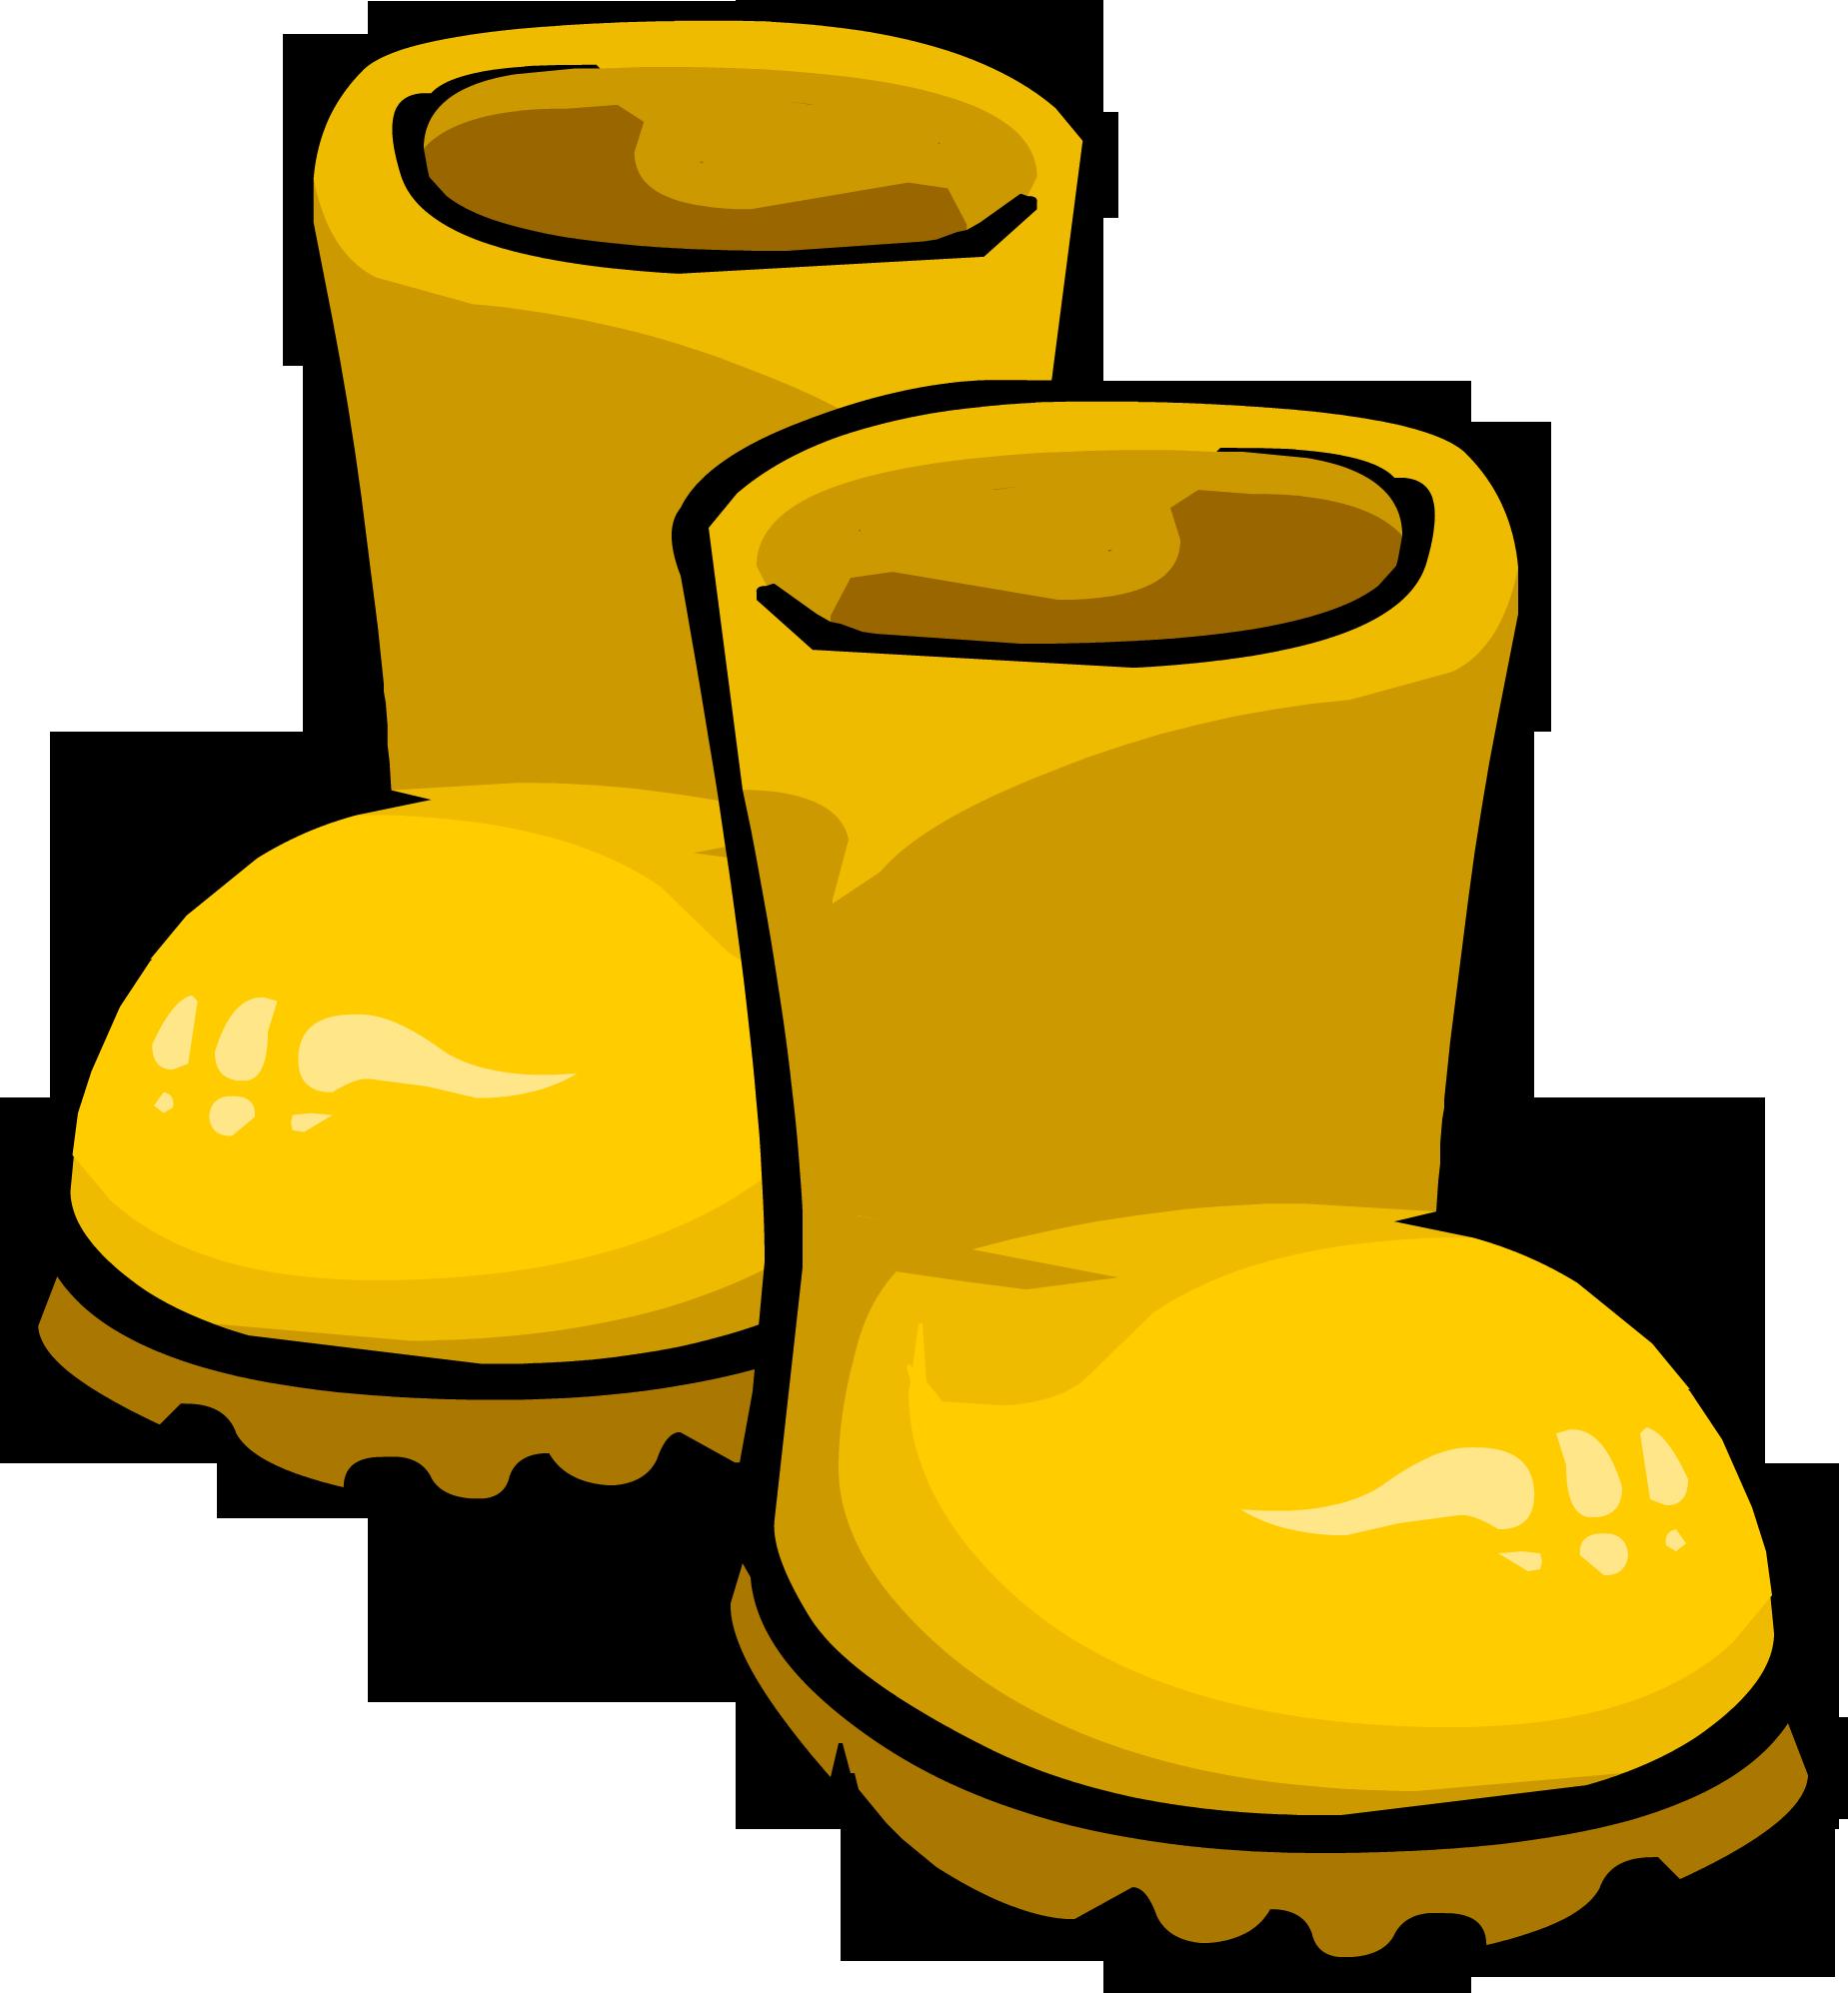 Yellow Rain Boots Clipart.